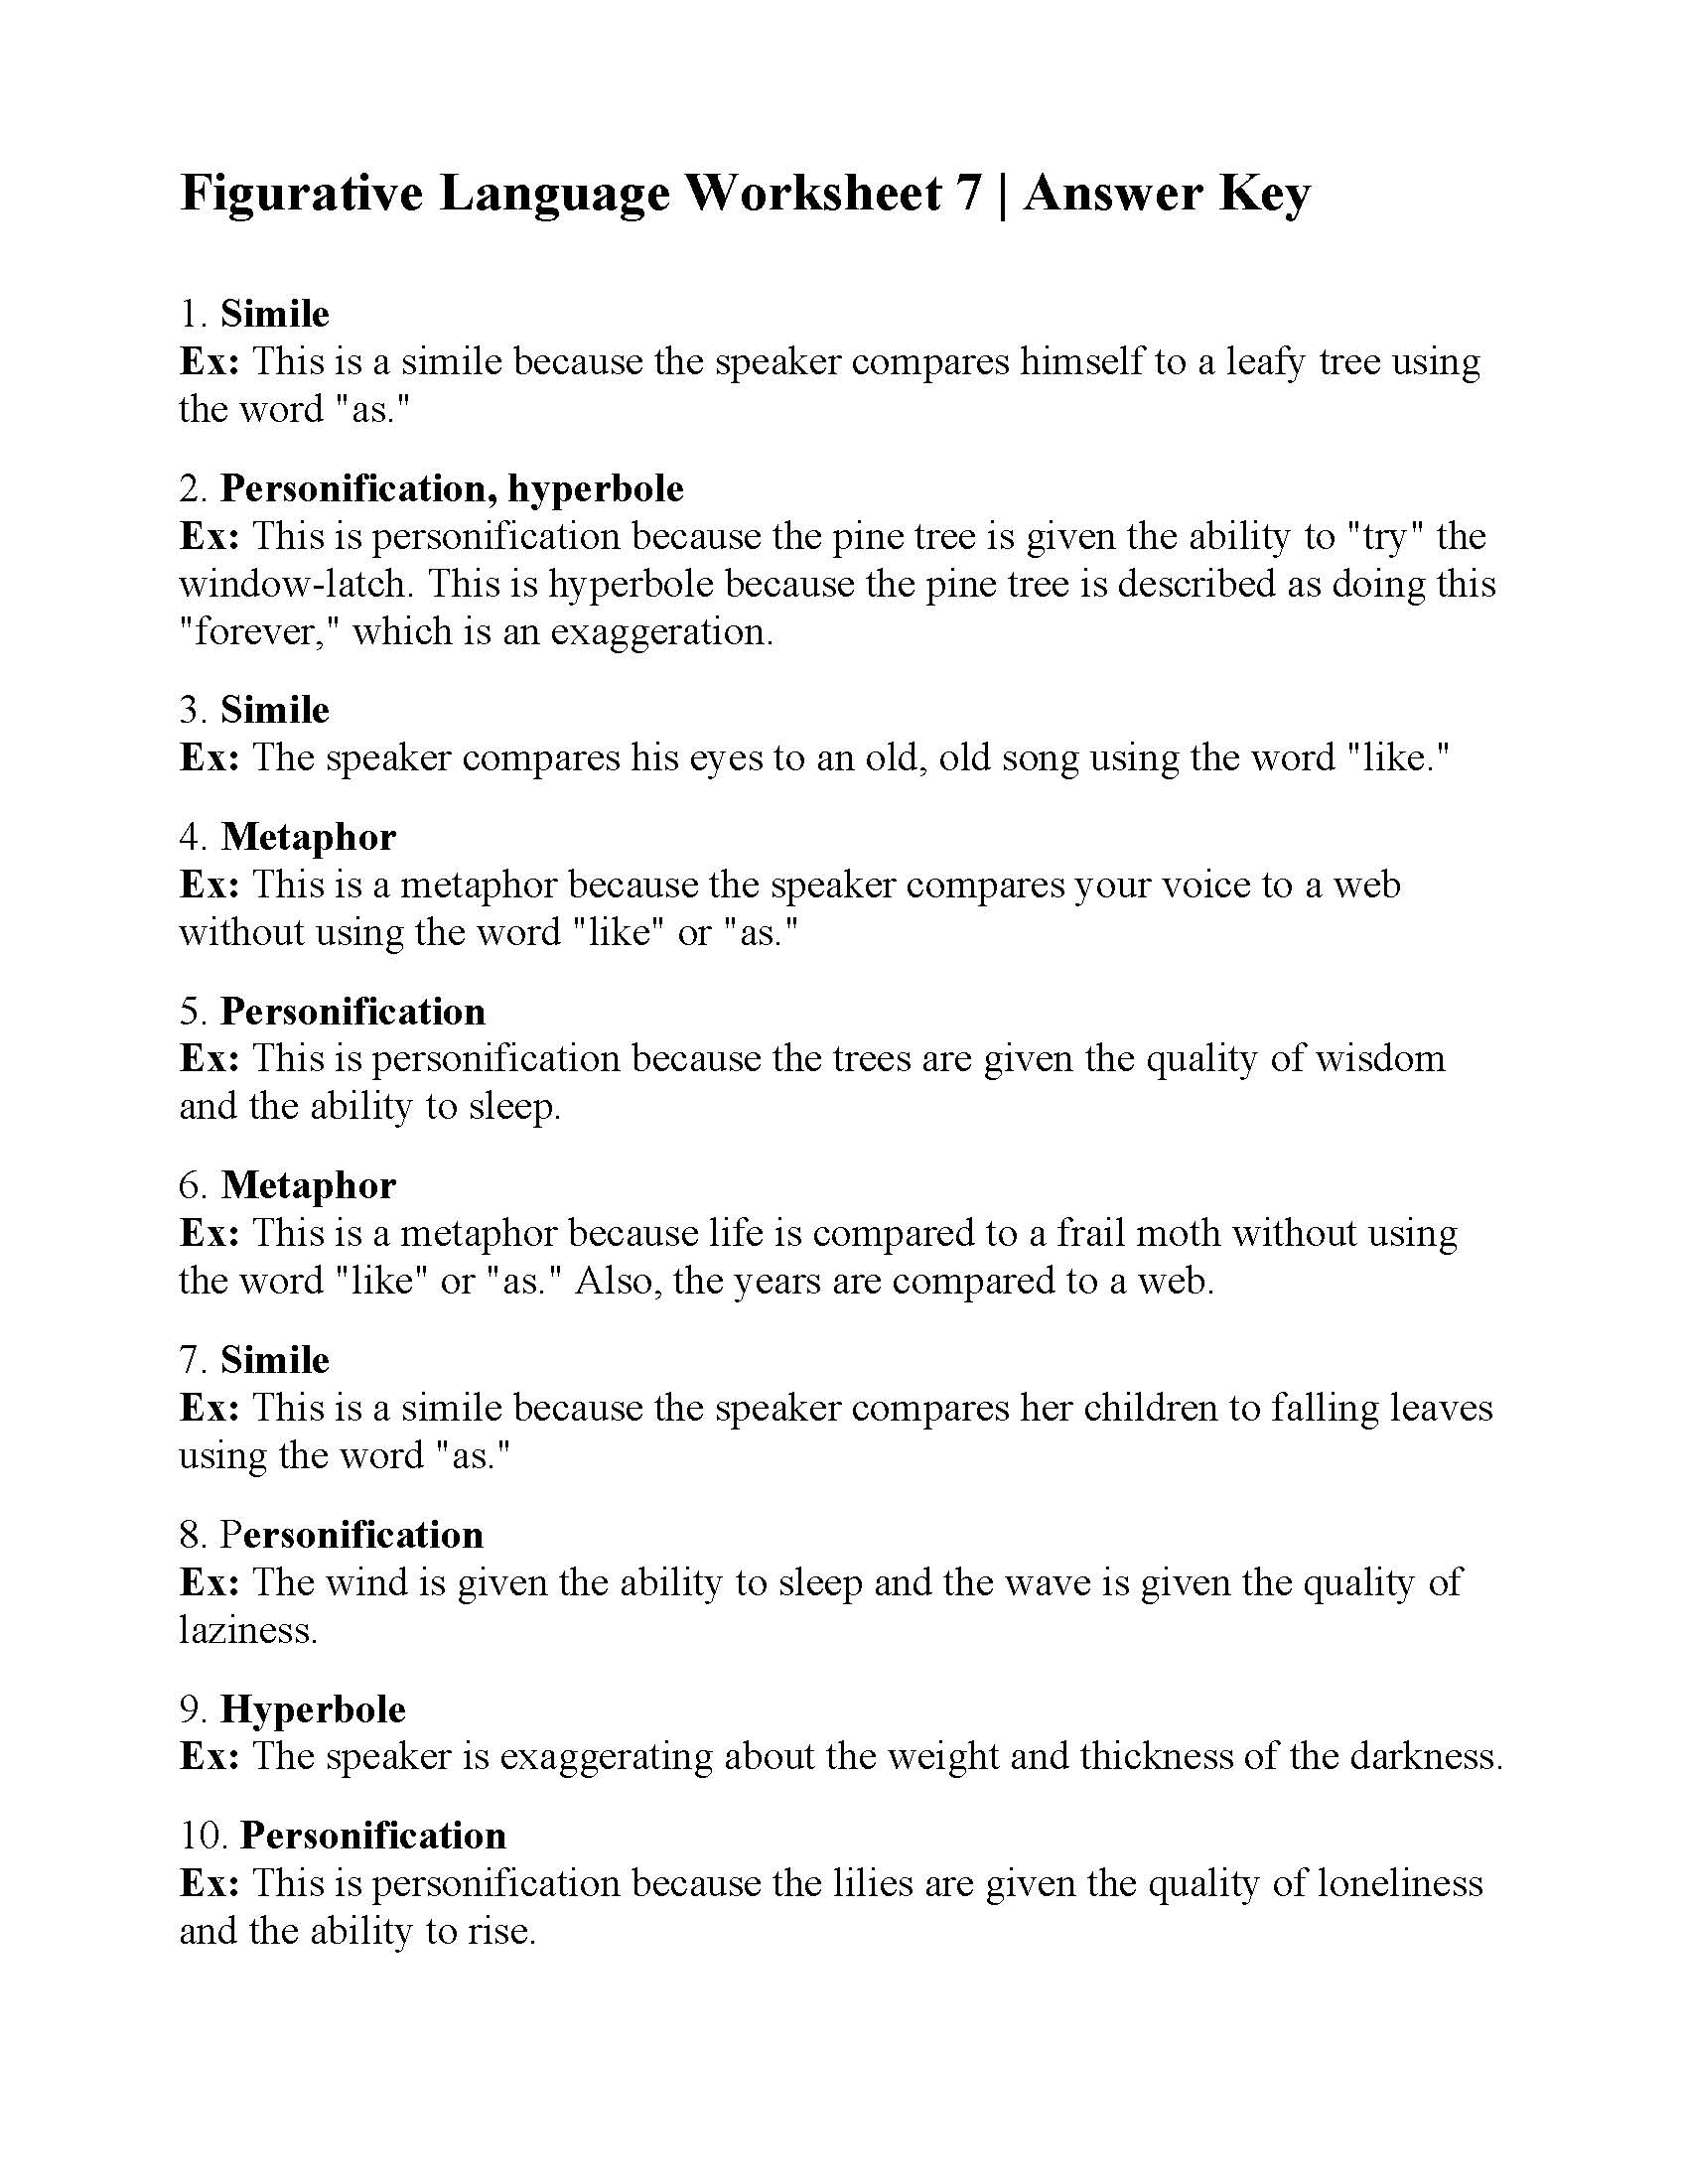 Figurative Language Worksheet Answers Printable Worksheets